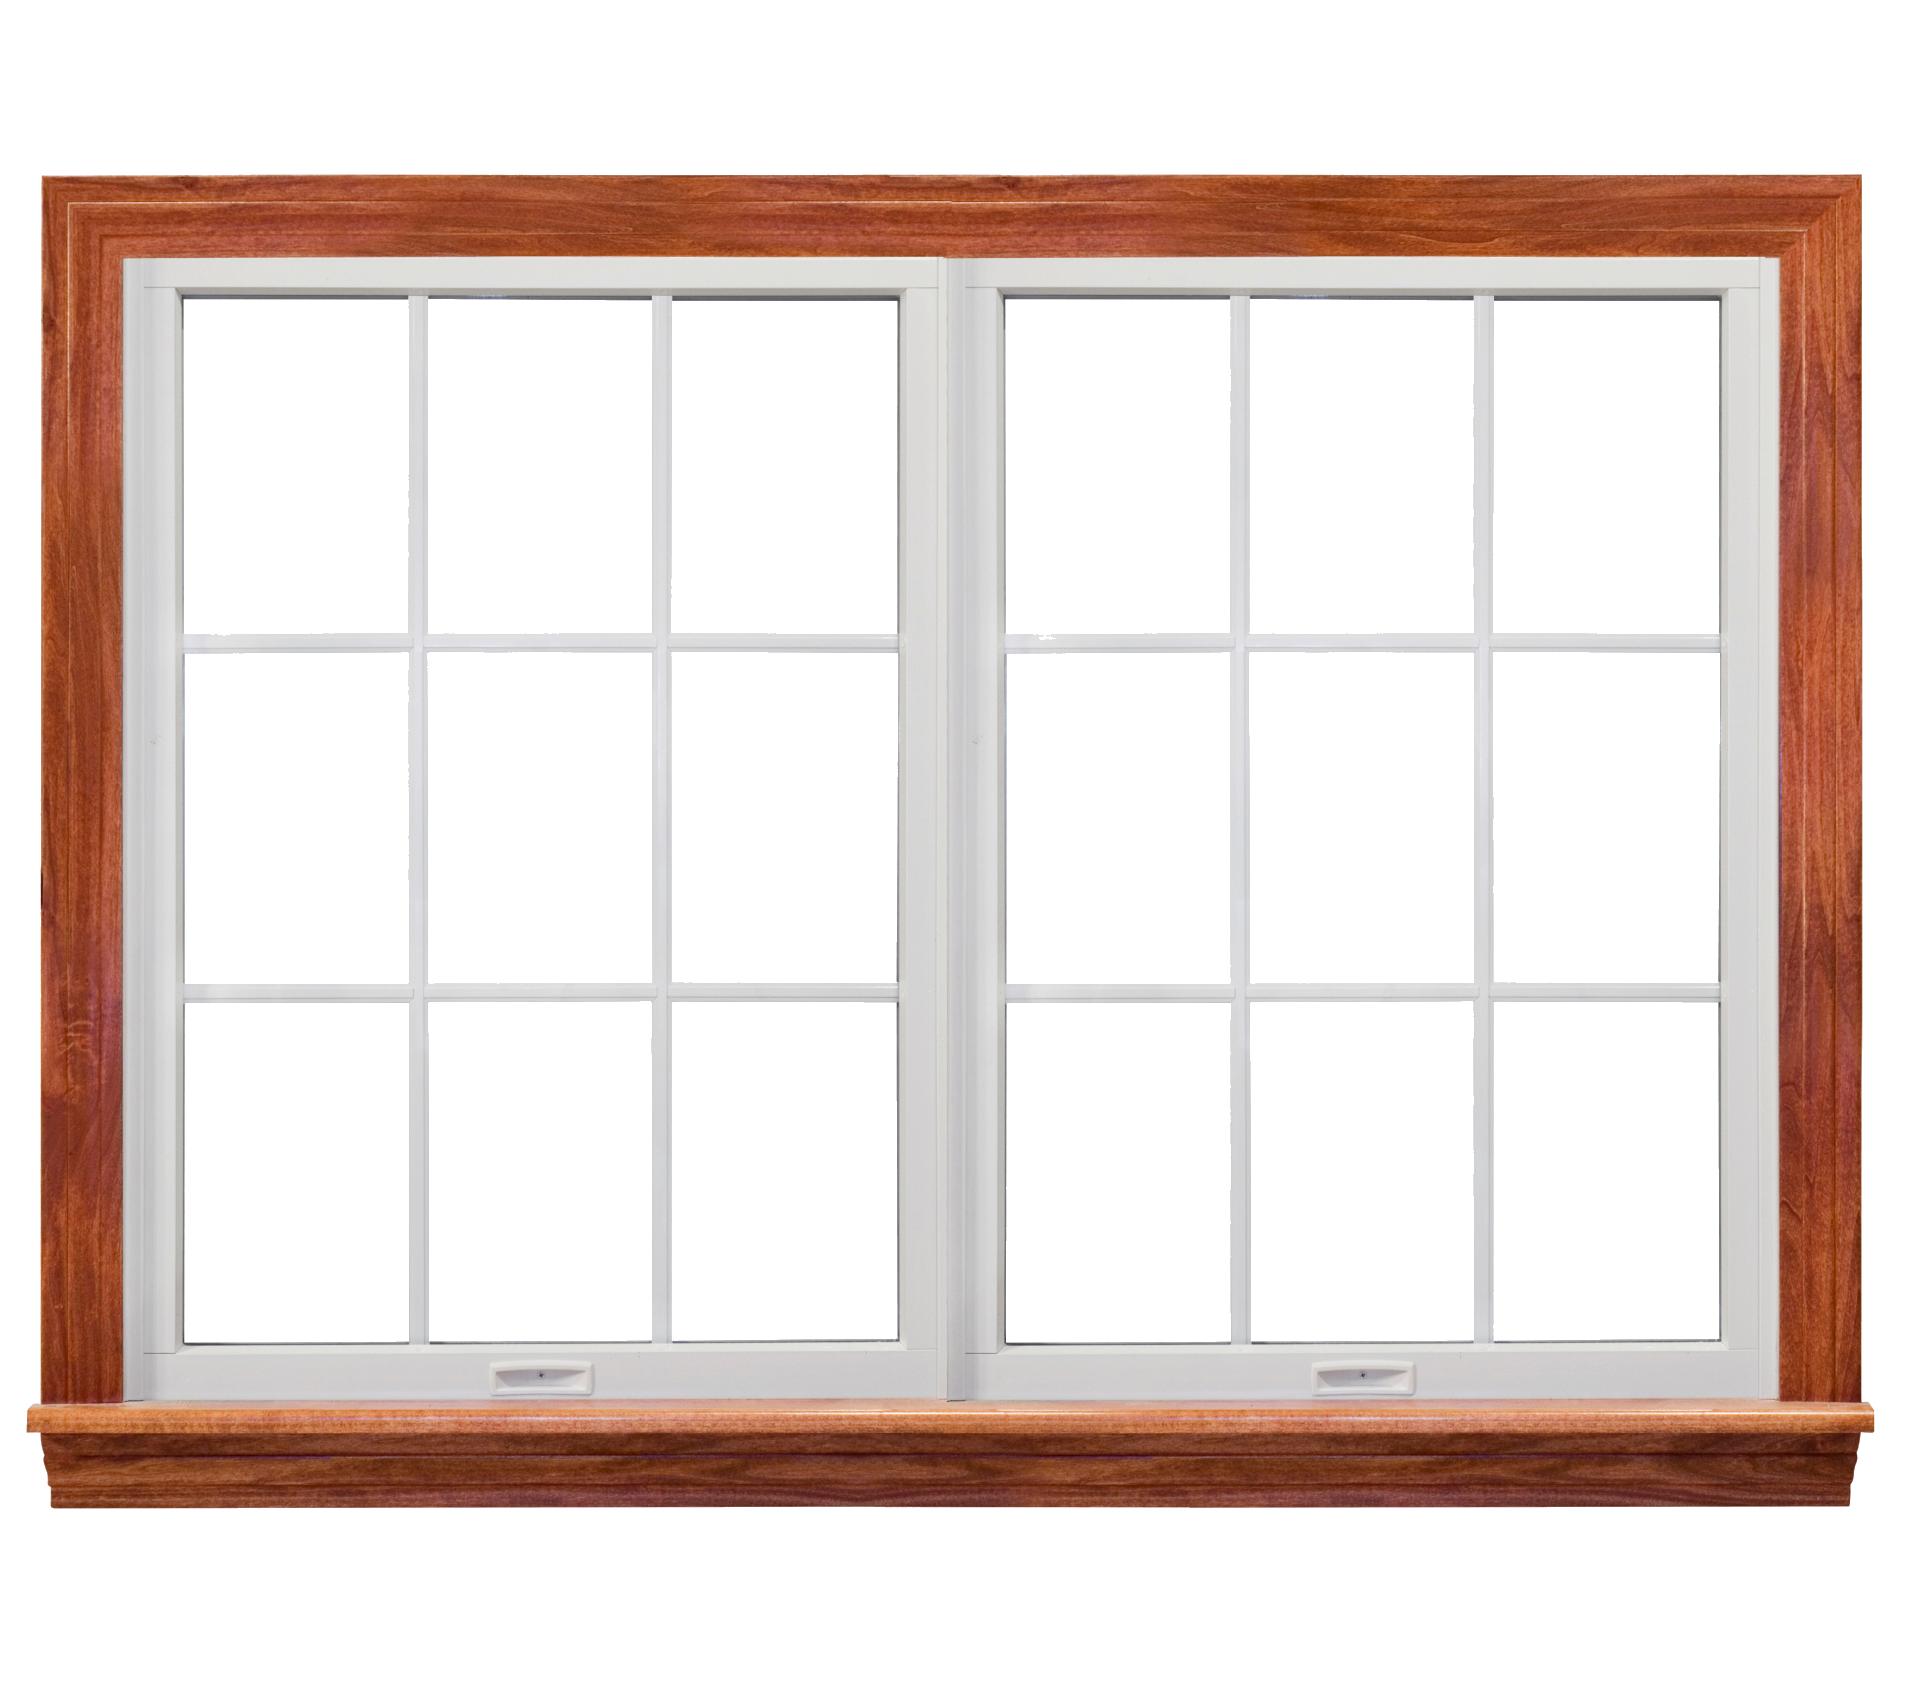 Window PNG Image.